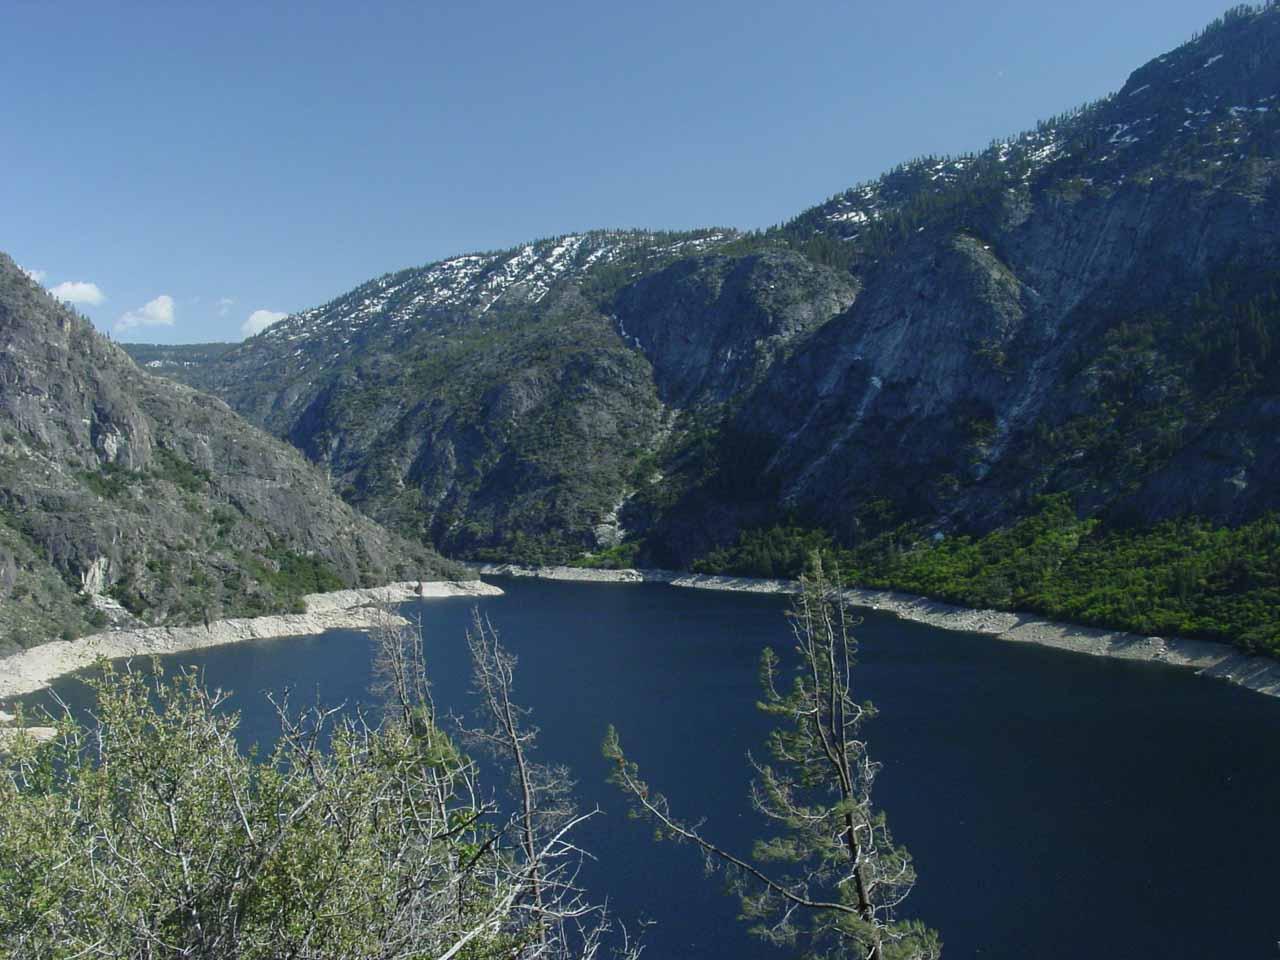 The manmade lake towards the head of Hetch Hetchy